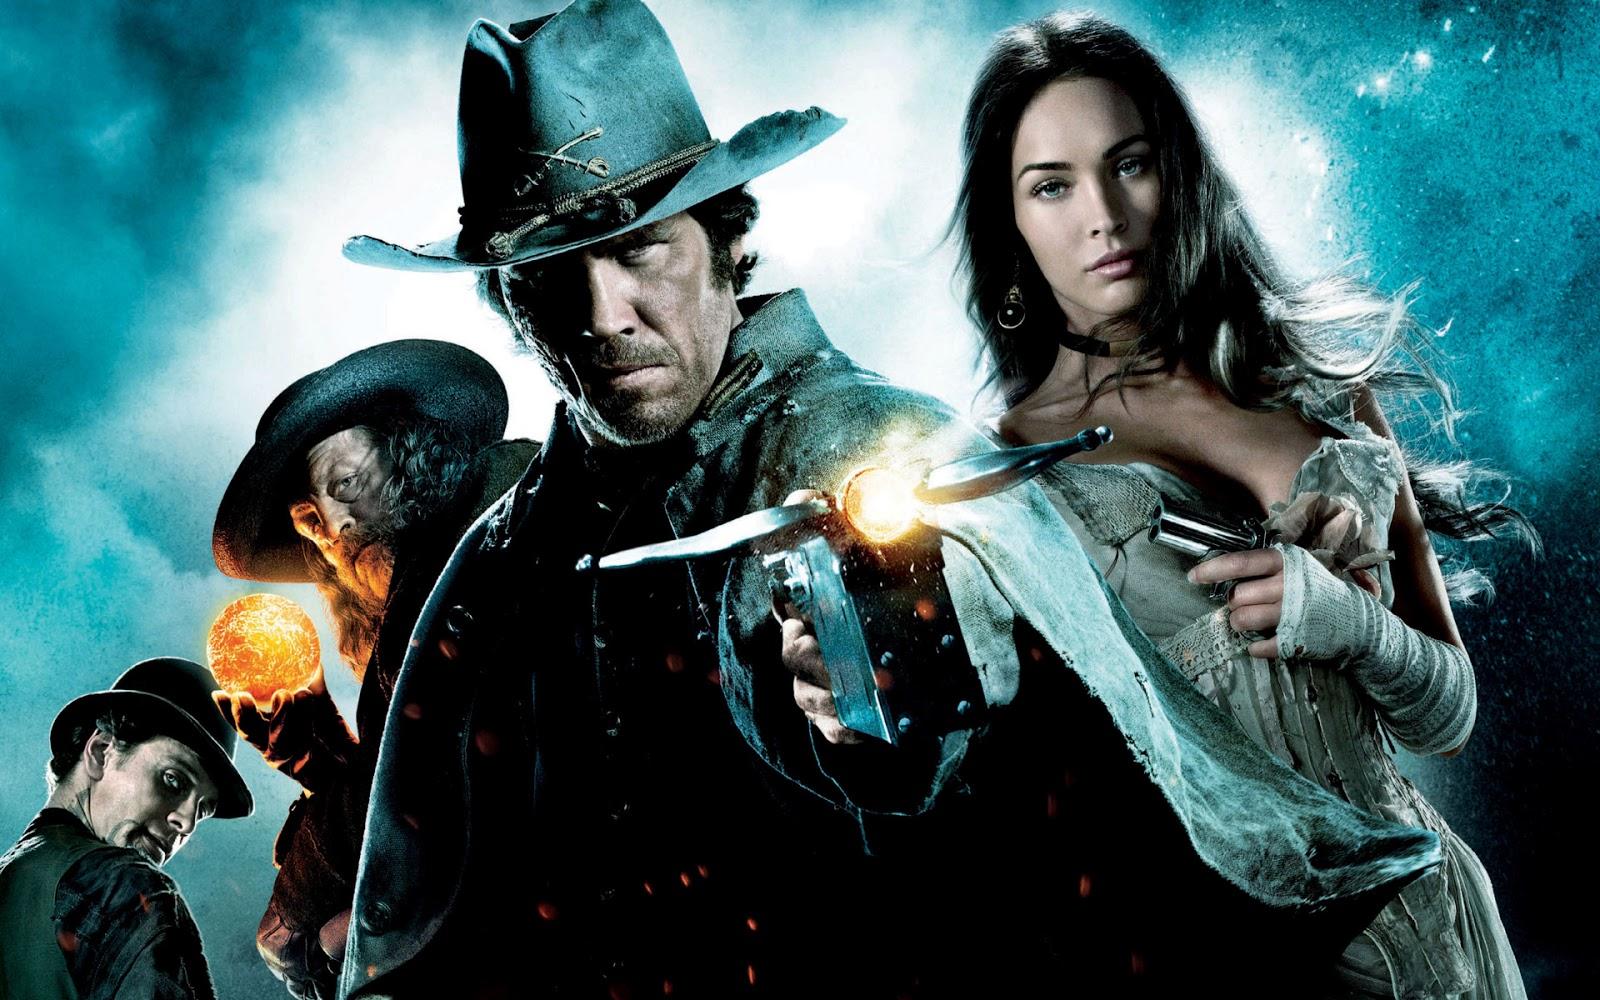 Beautiful Wallpaper Movie Hollywood - Movies%2Bhd%2BWallpapers%2B%252810%2529  Gallery_626651.jpg